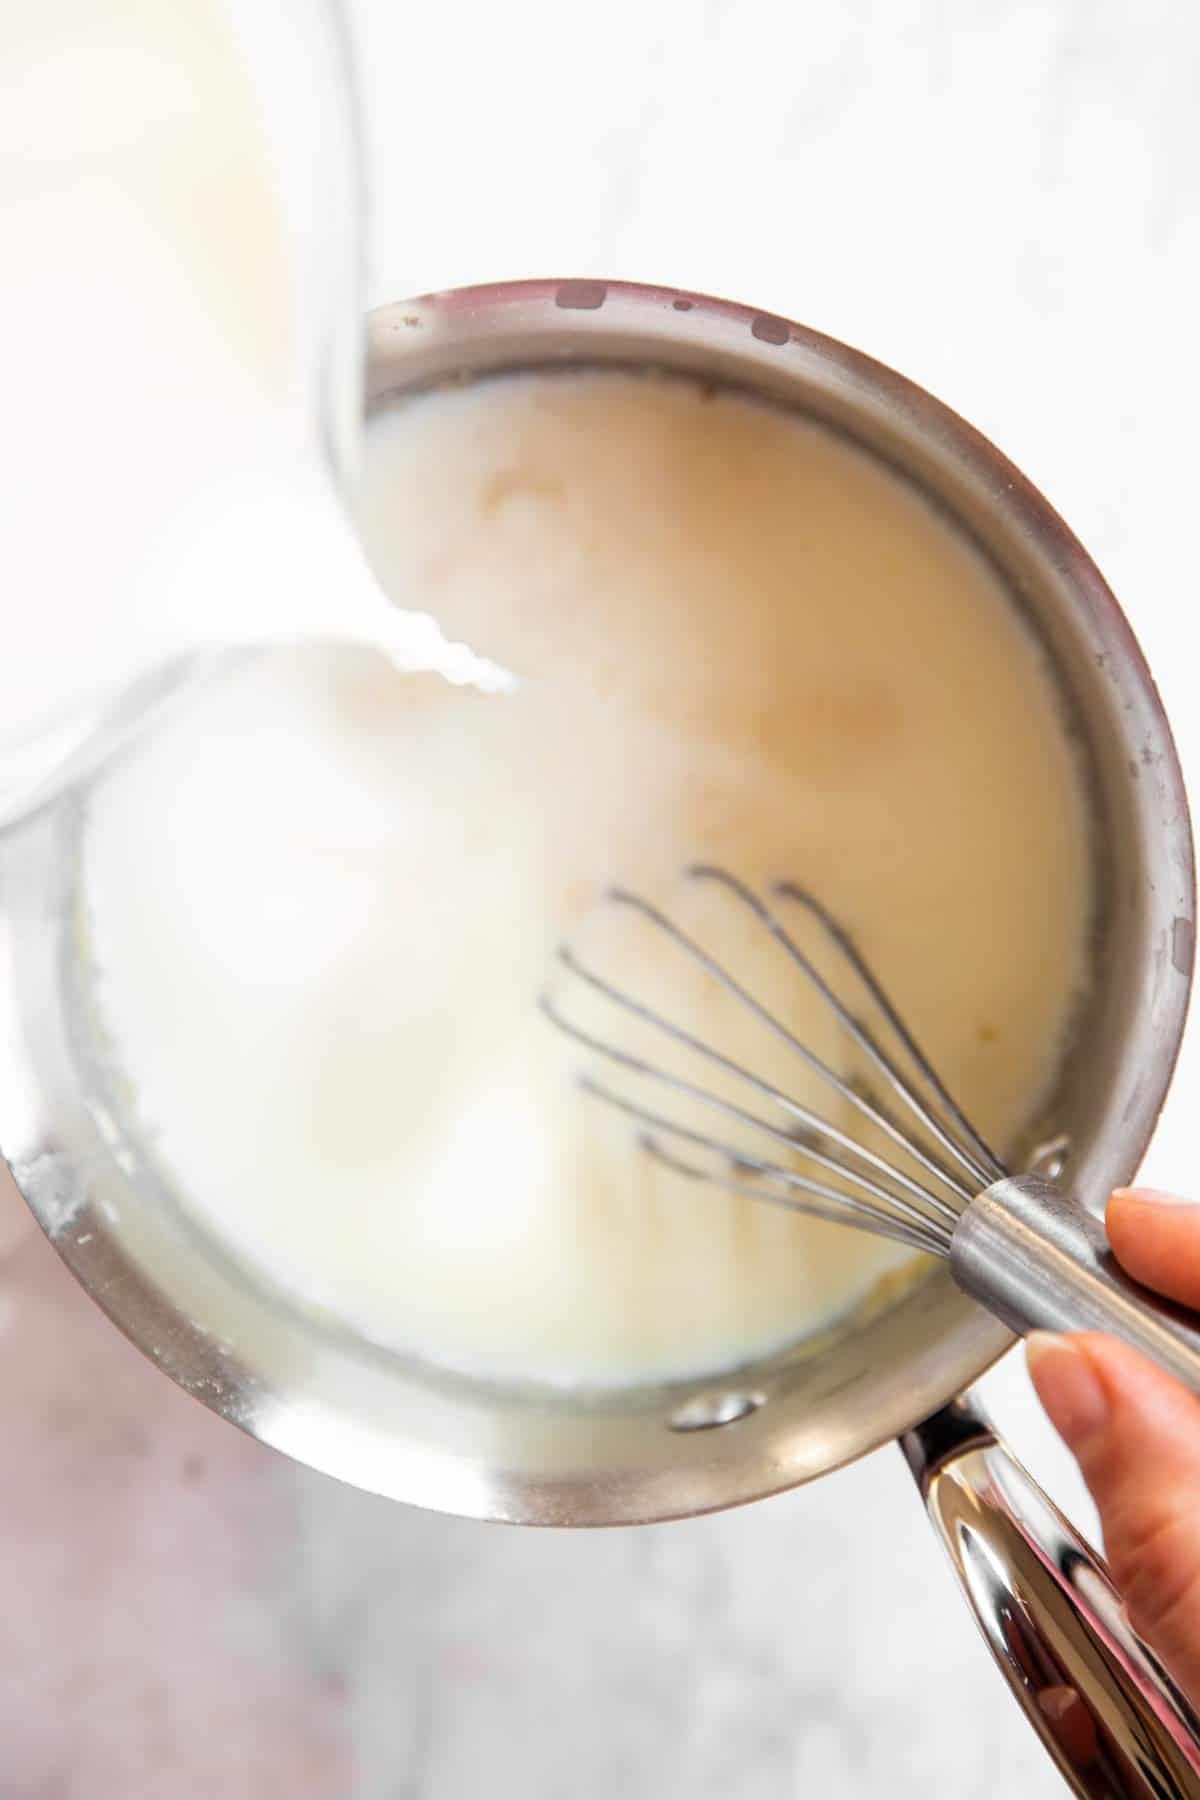 pouring milk into saucepan